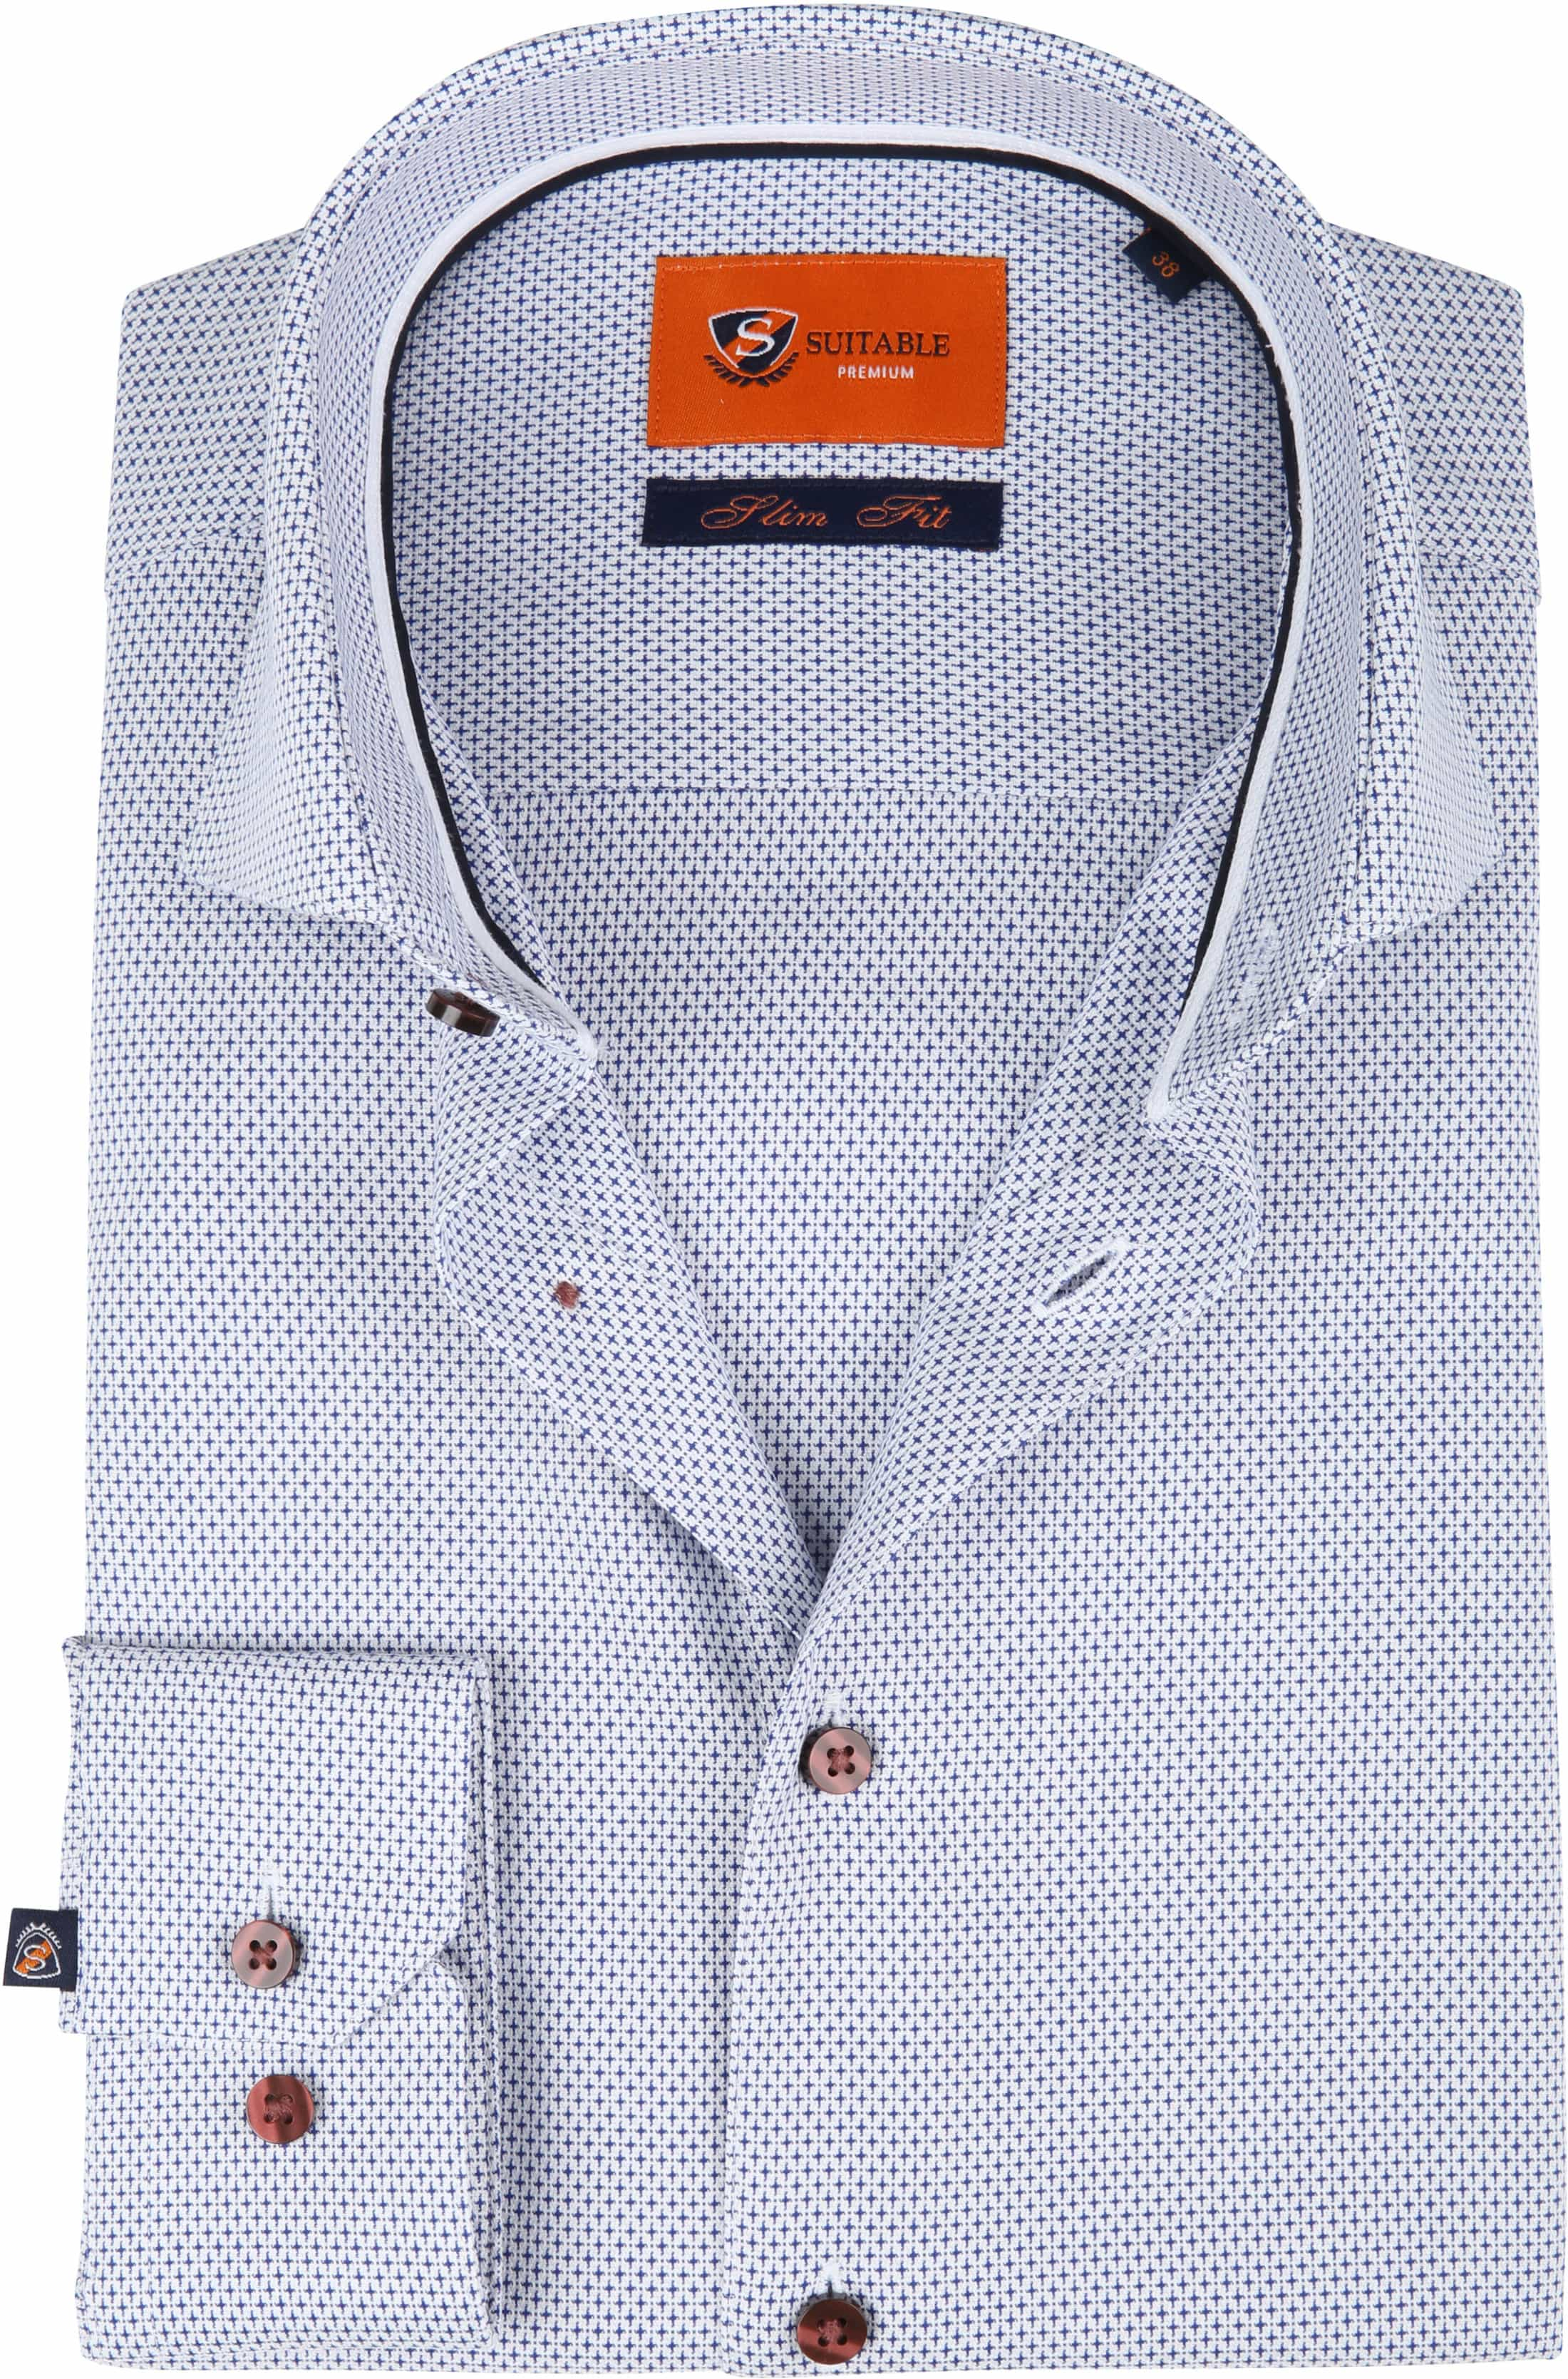 Suitable Overhemd Blauw Dessin D82-20 foto 0